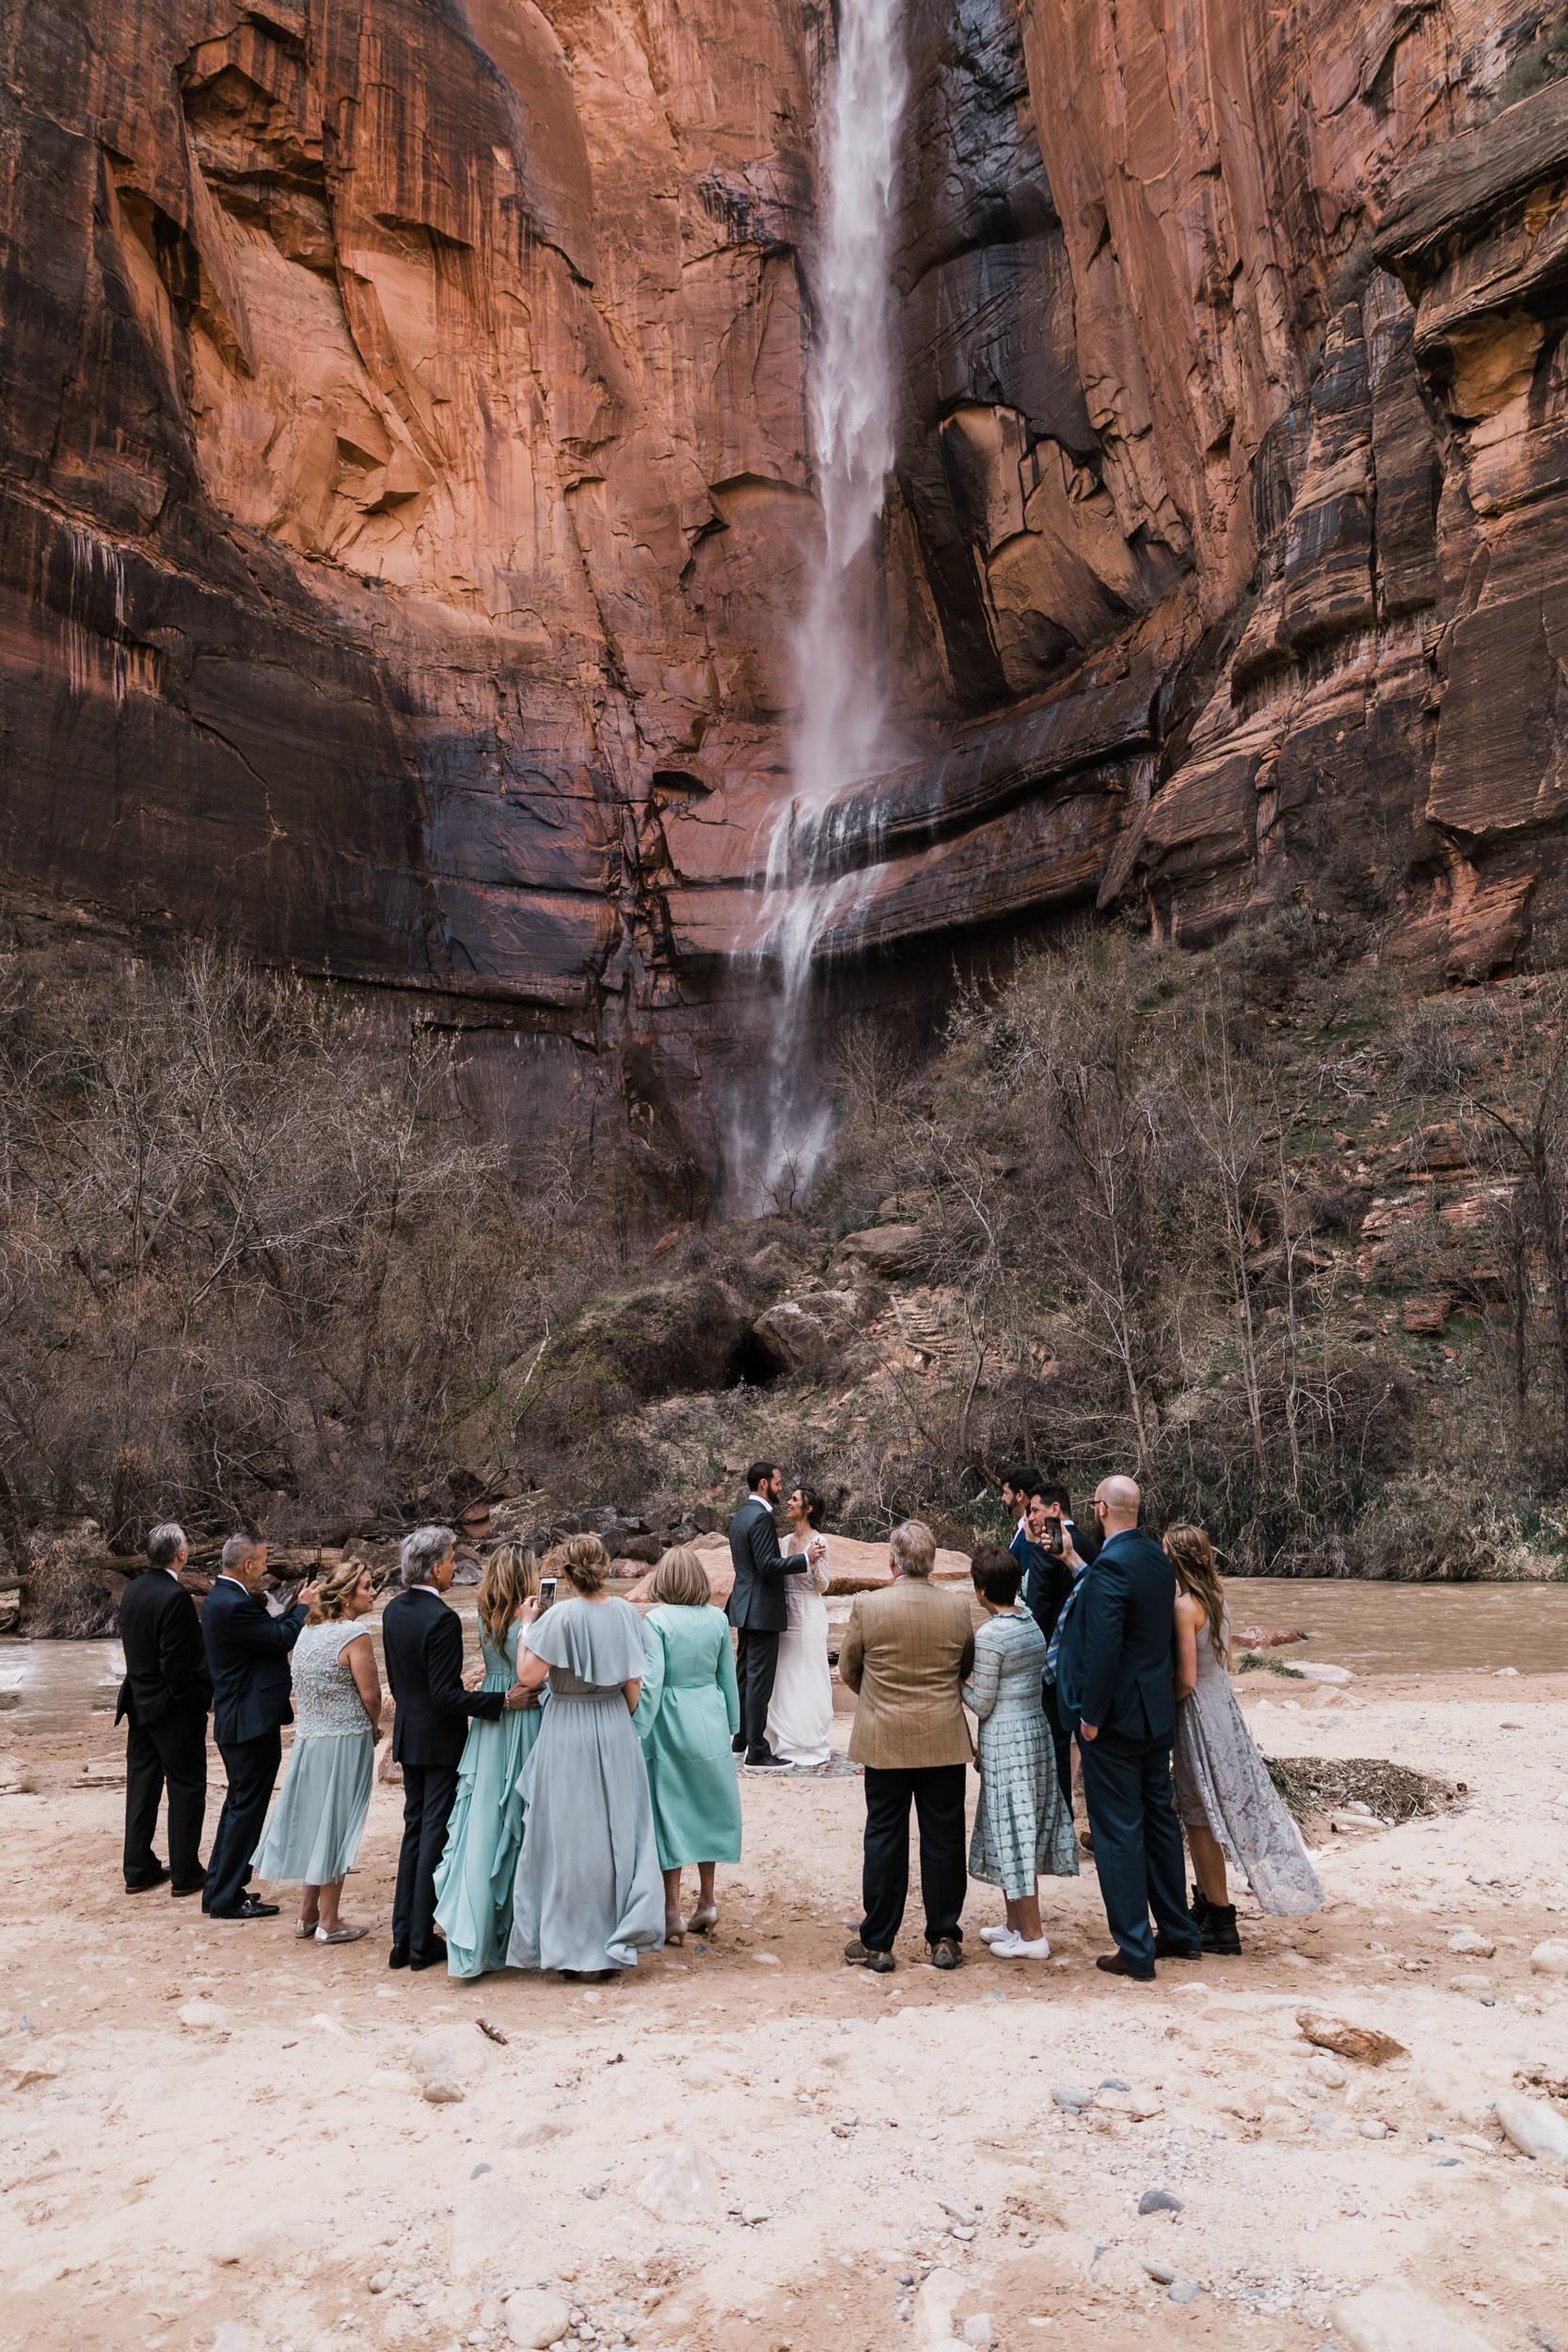 Zion-National-Park-Adventure-Wedding-Hearnes-Elopement-Photography-26.jpg